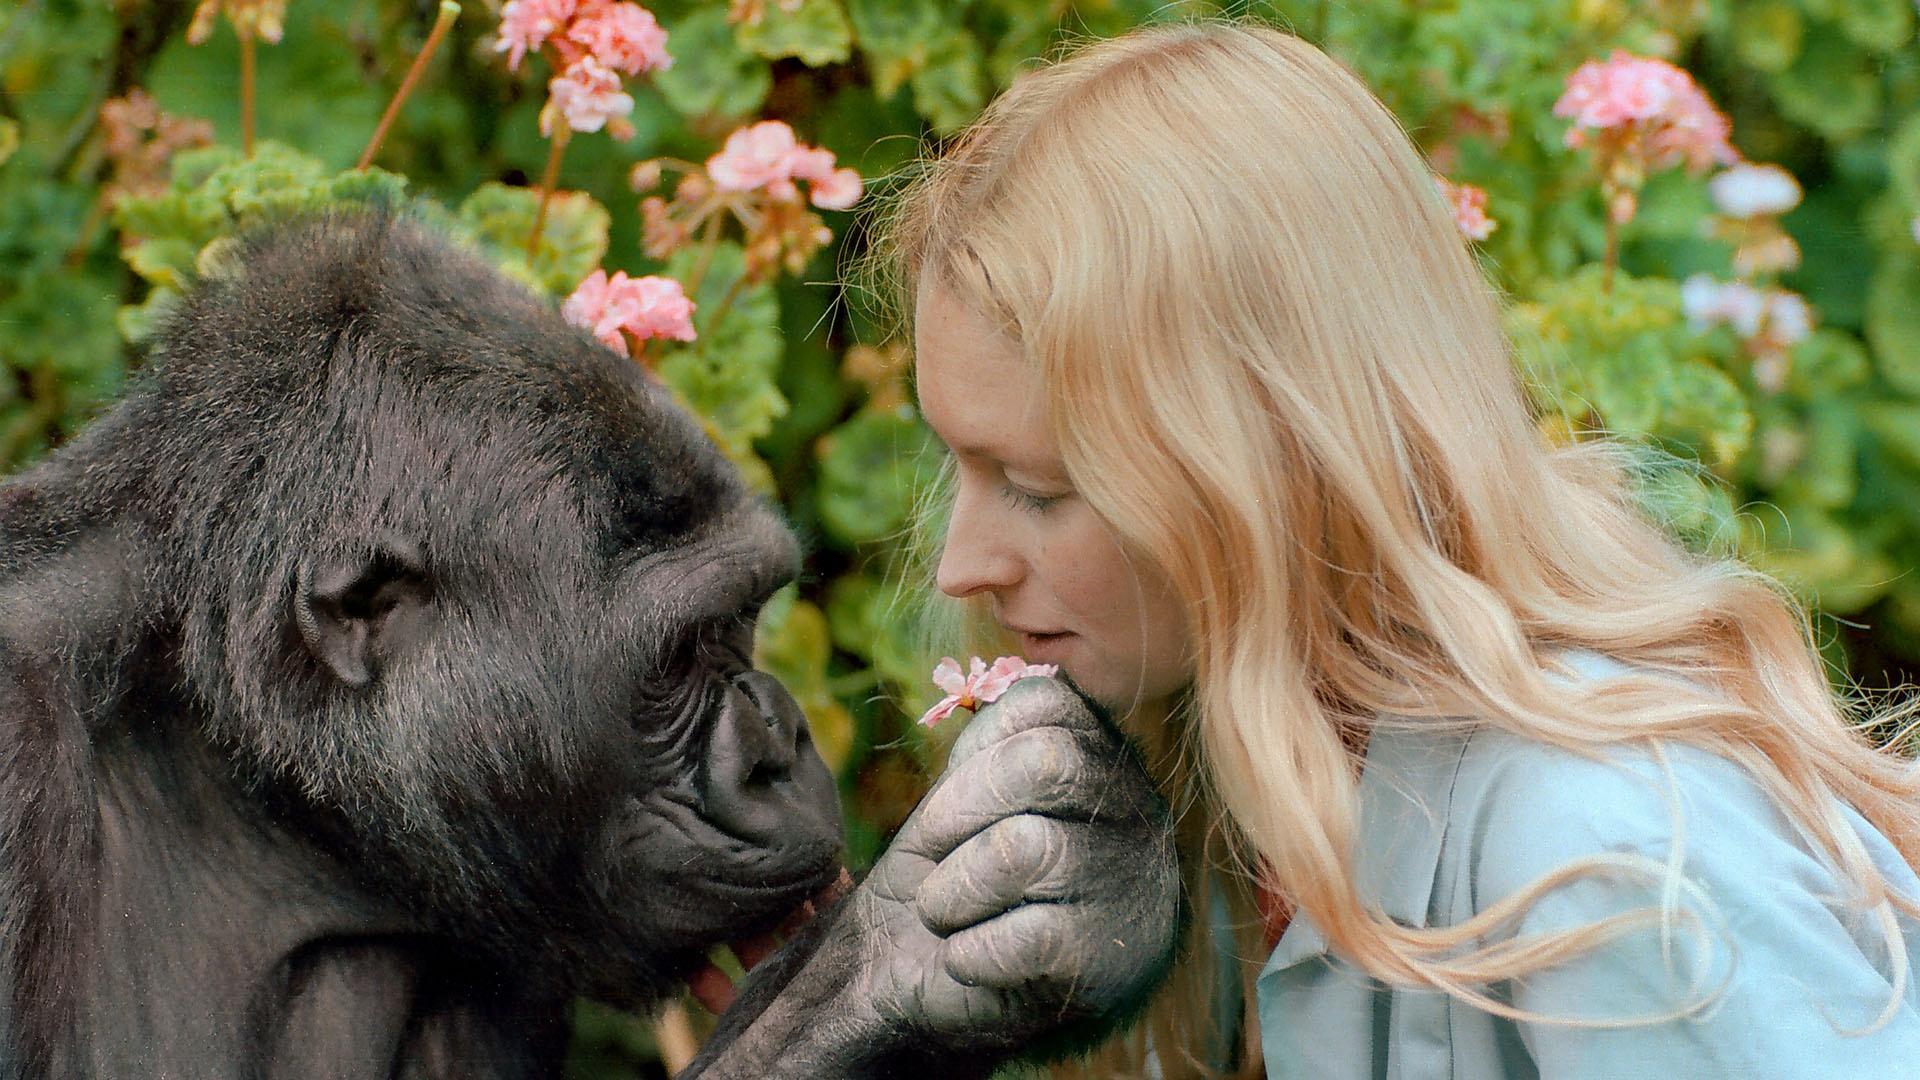 Koko - The Gorilla Who Talks | Full Episode